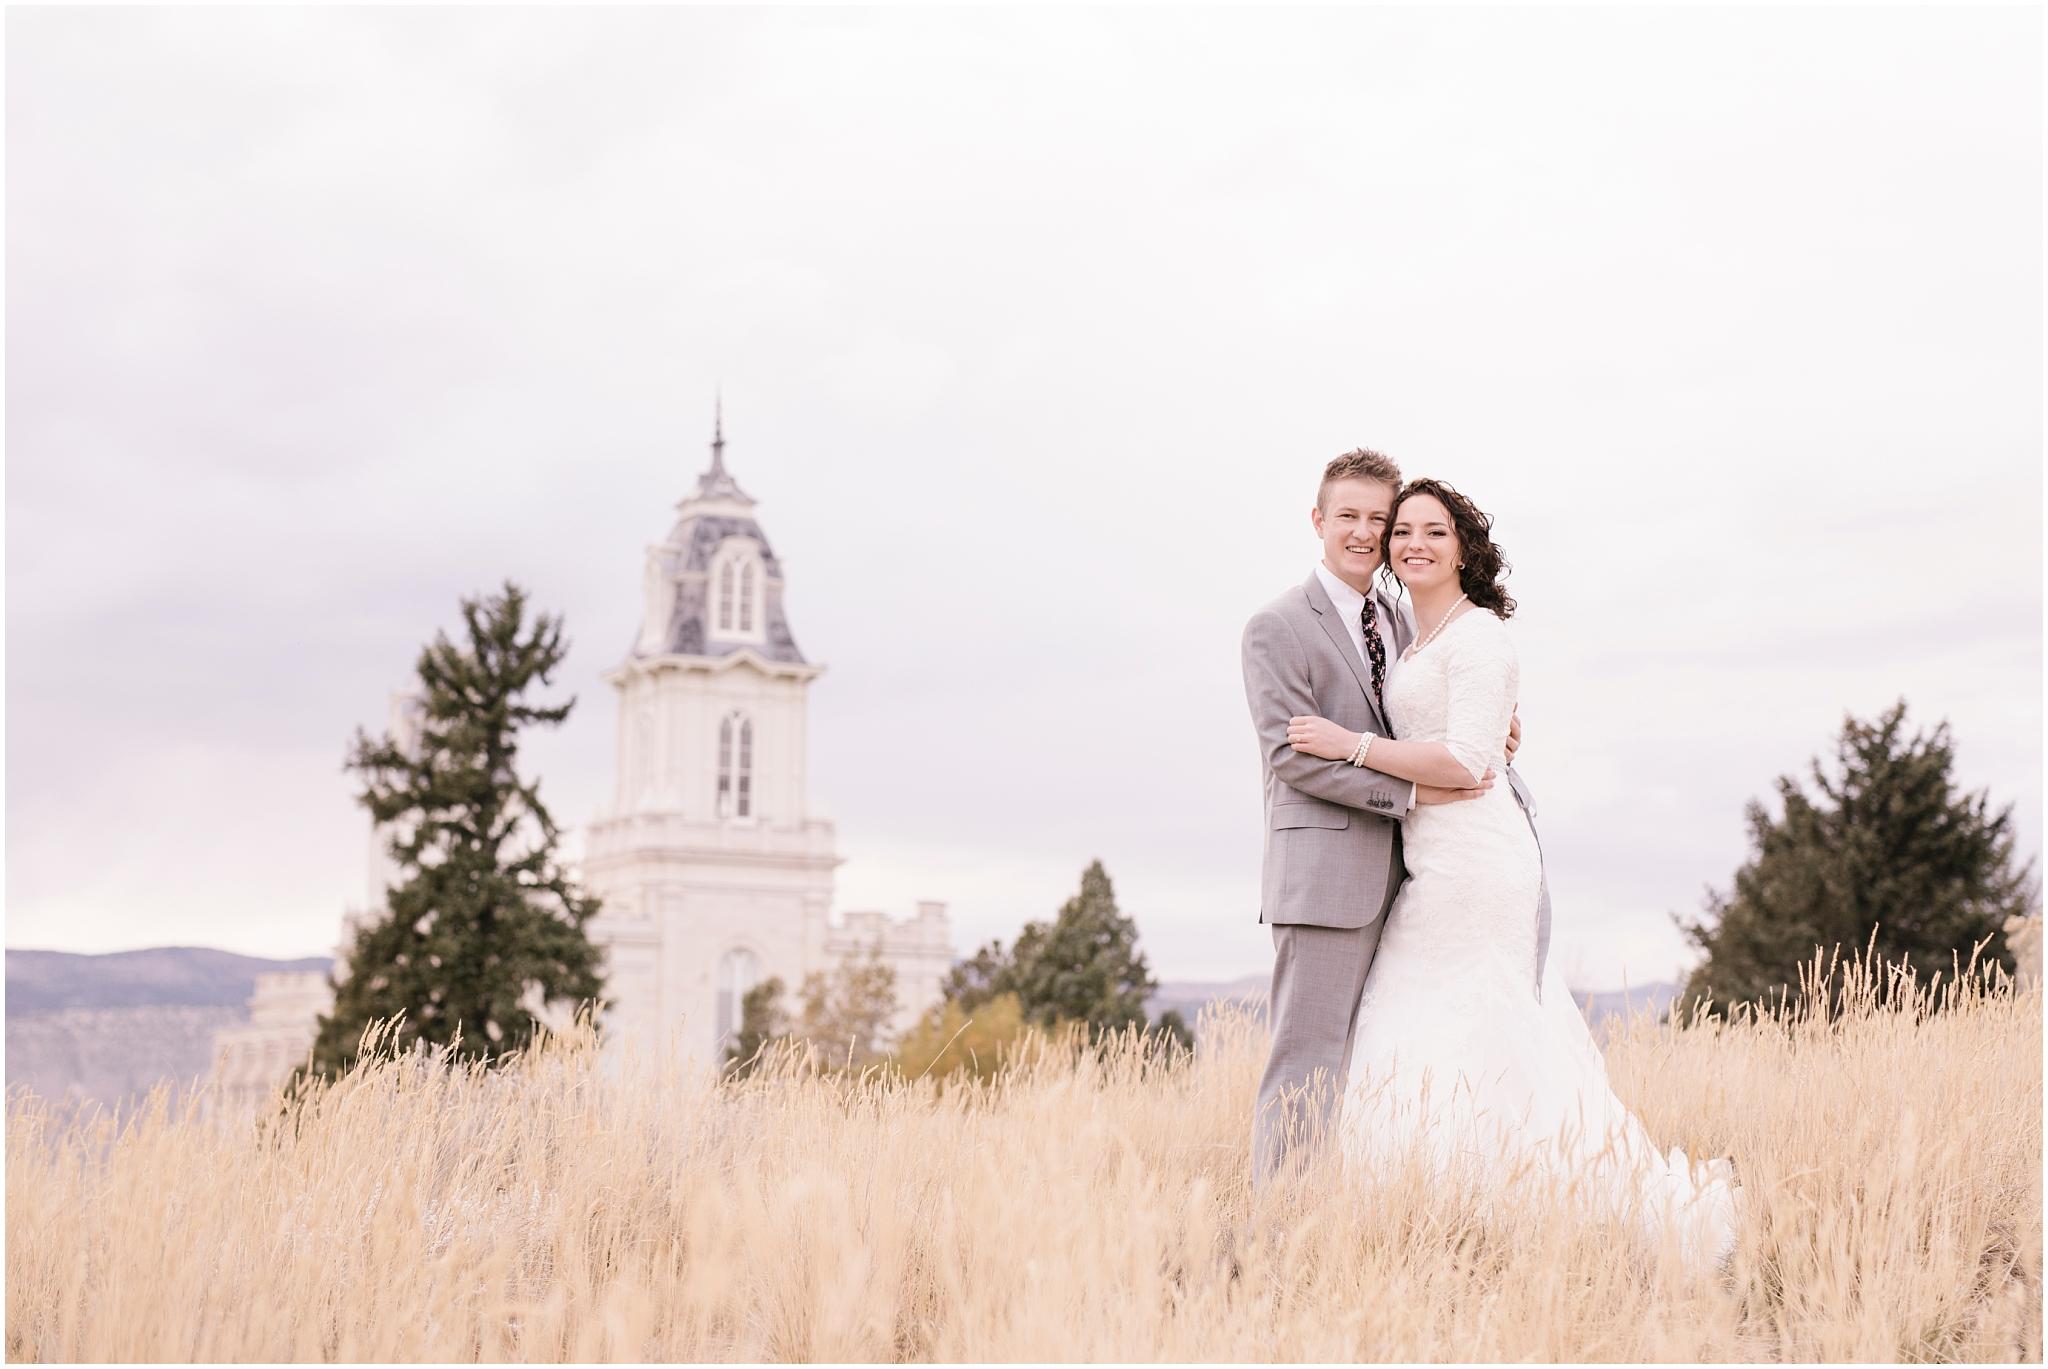 BA-Bridals-82_Lizzie-B-Imagery-Utah-Wedding-Photographer-Central-Utah-Photographer-Utah-County-Manti-Utah-Temple.jpg